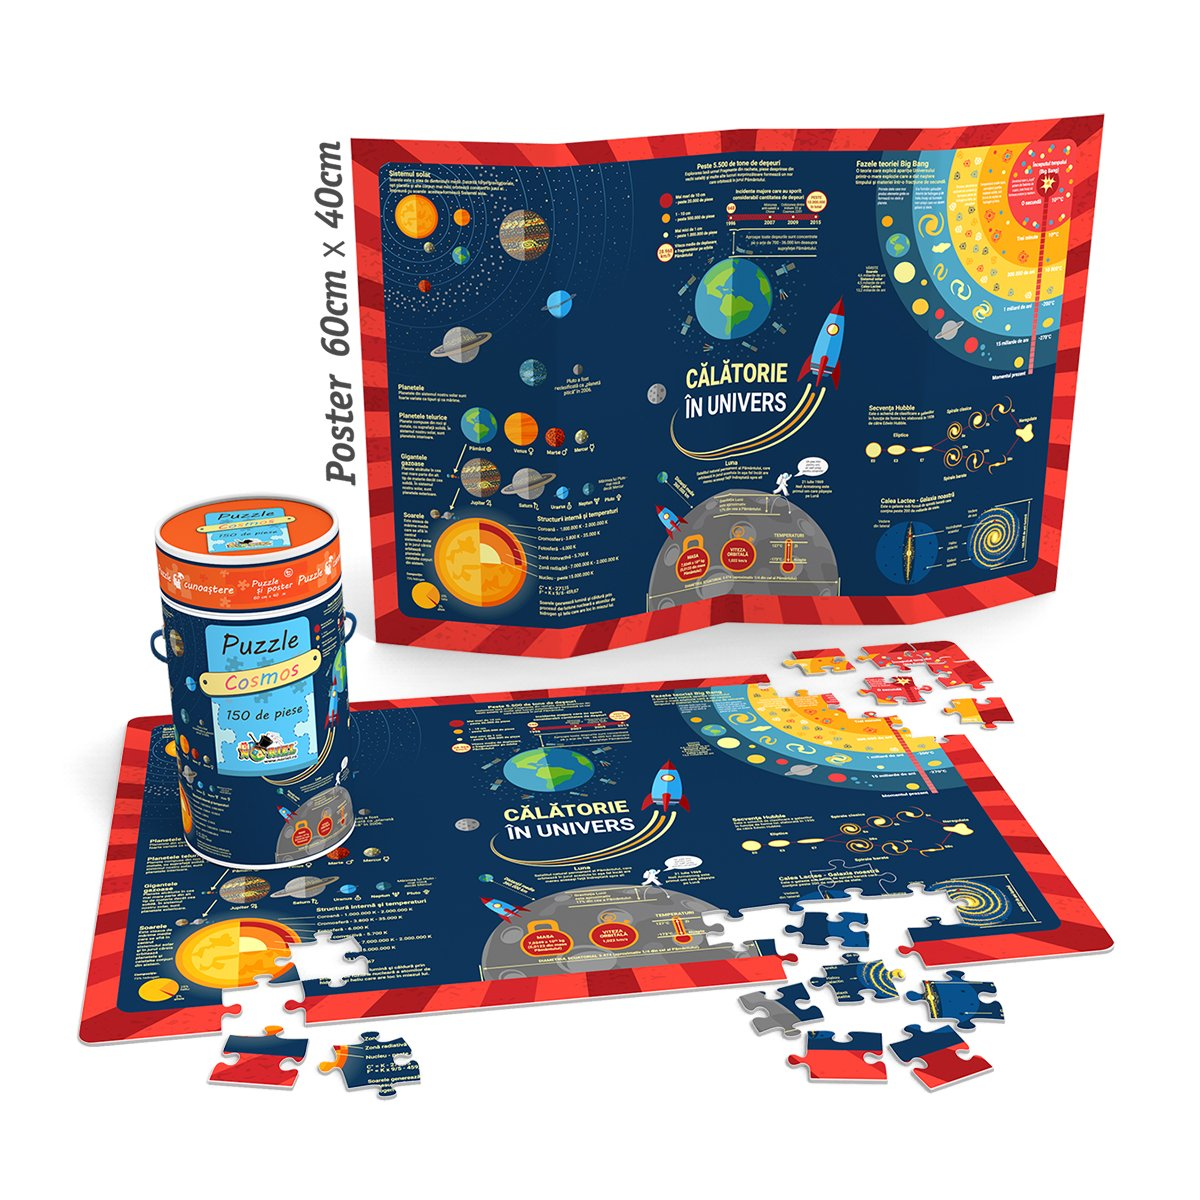 Puzzle Cunoastere Noriel - Calatorie in univers, 150 piese